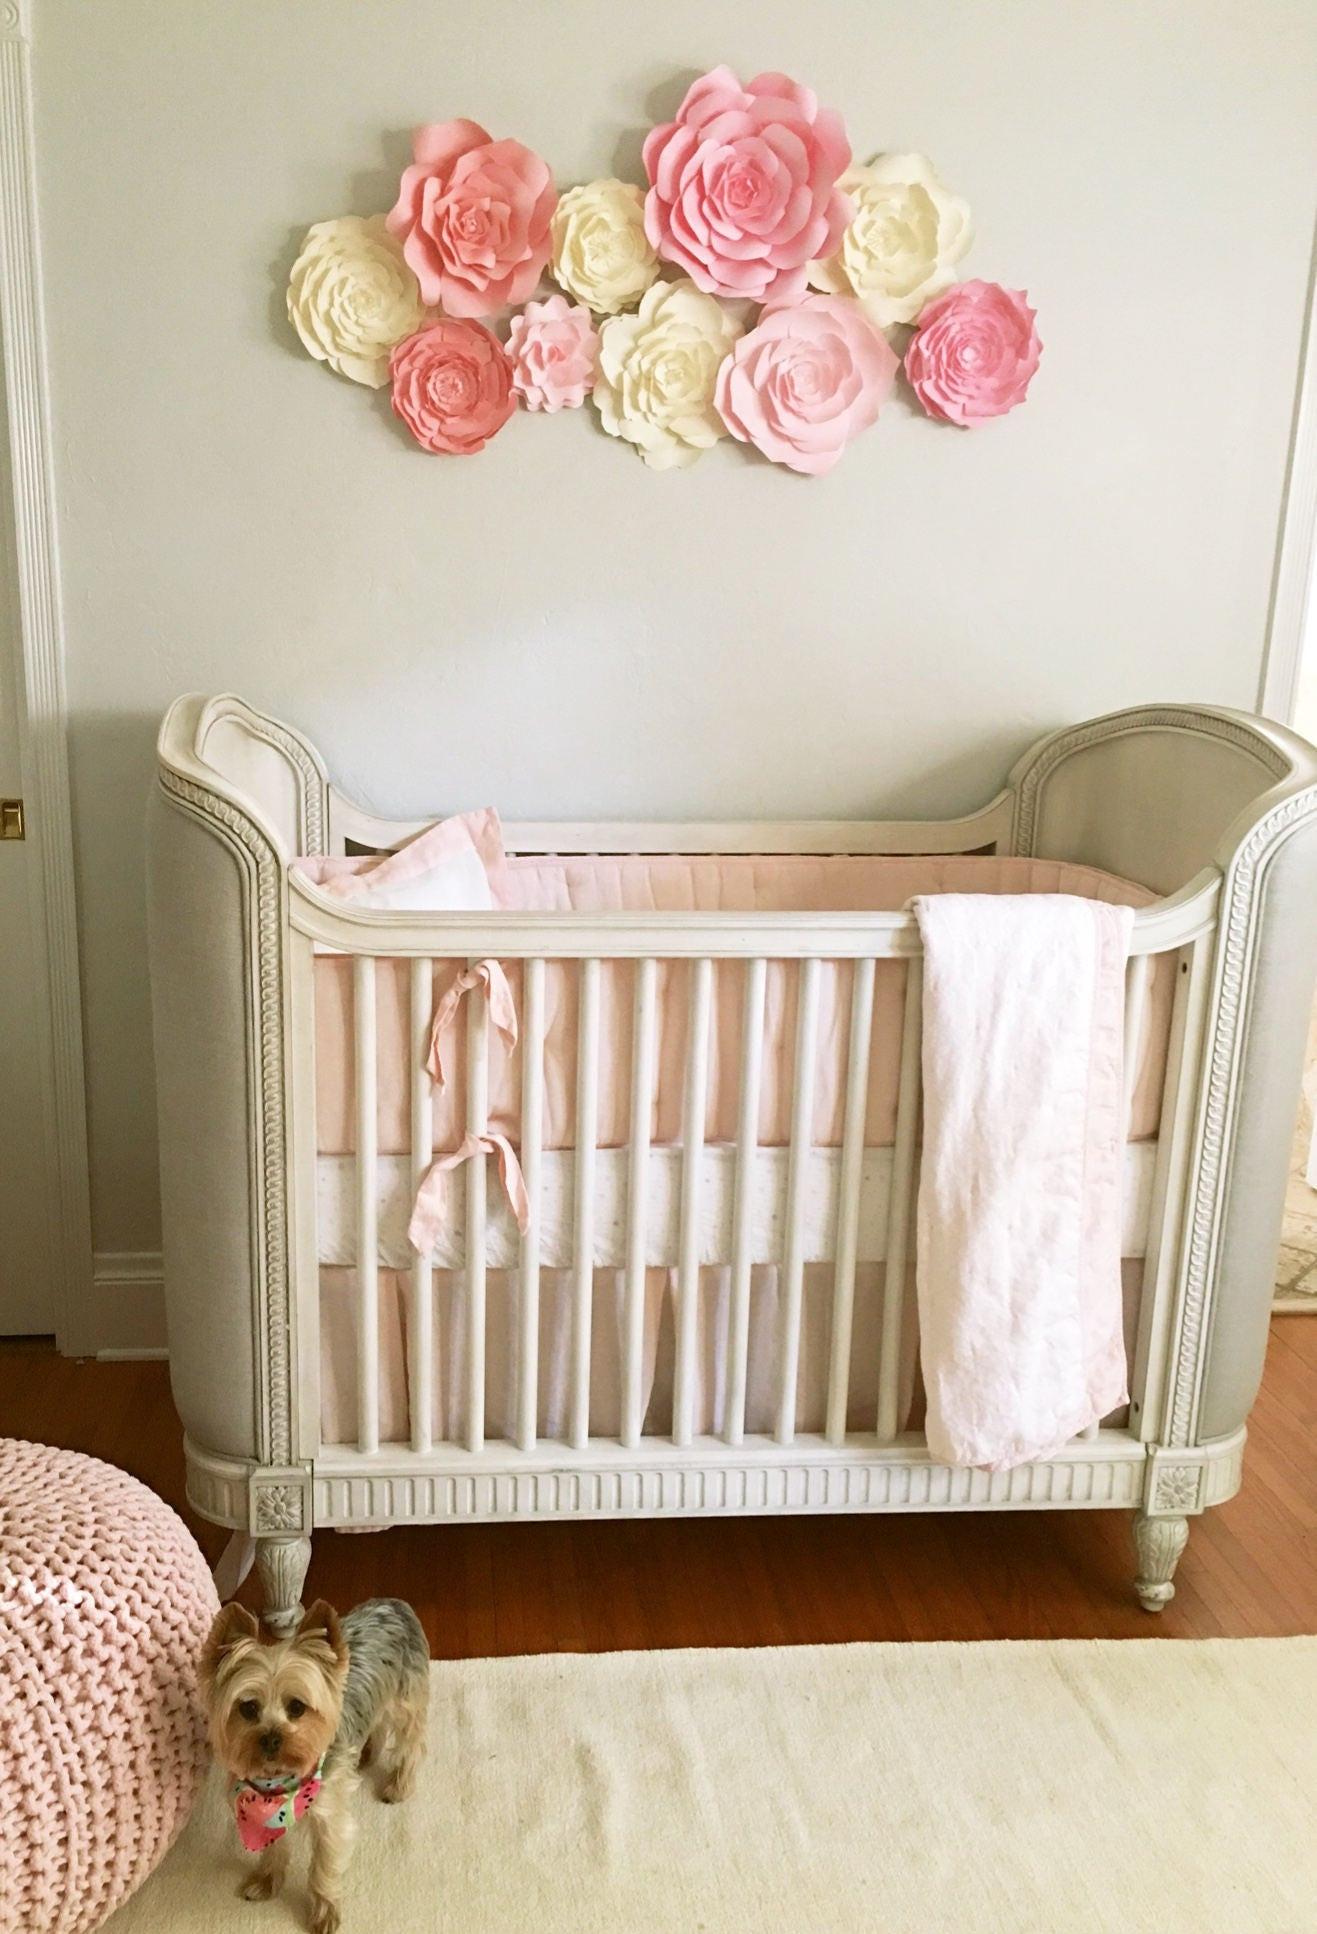 Baby Girl Room Decoration  Baby nursery wall decor paper flowers for girls nursery